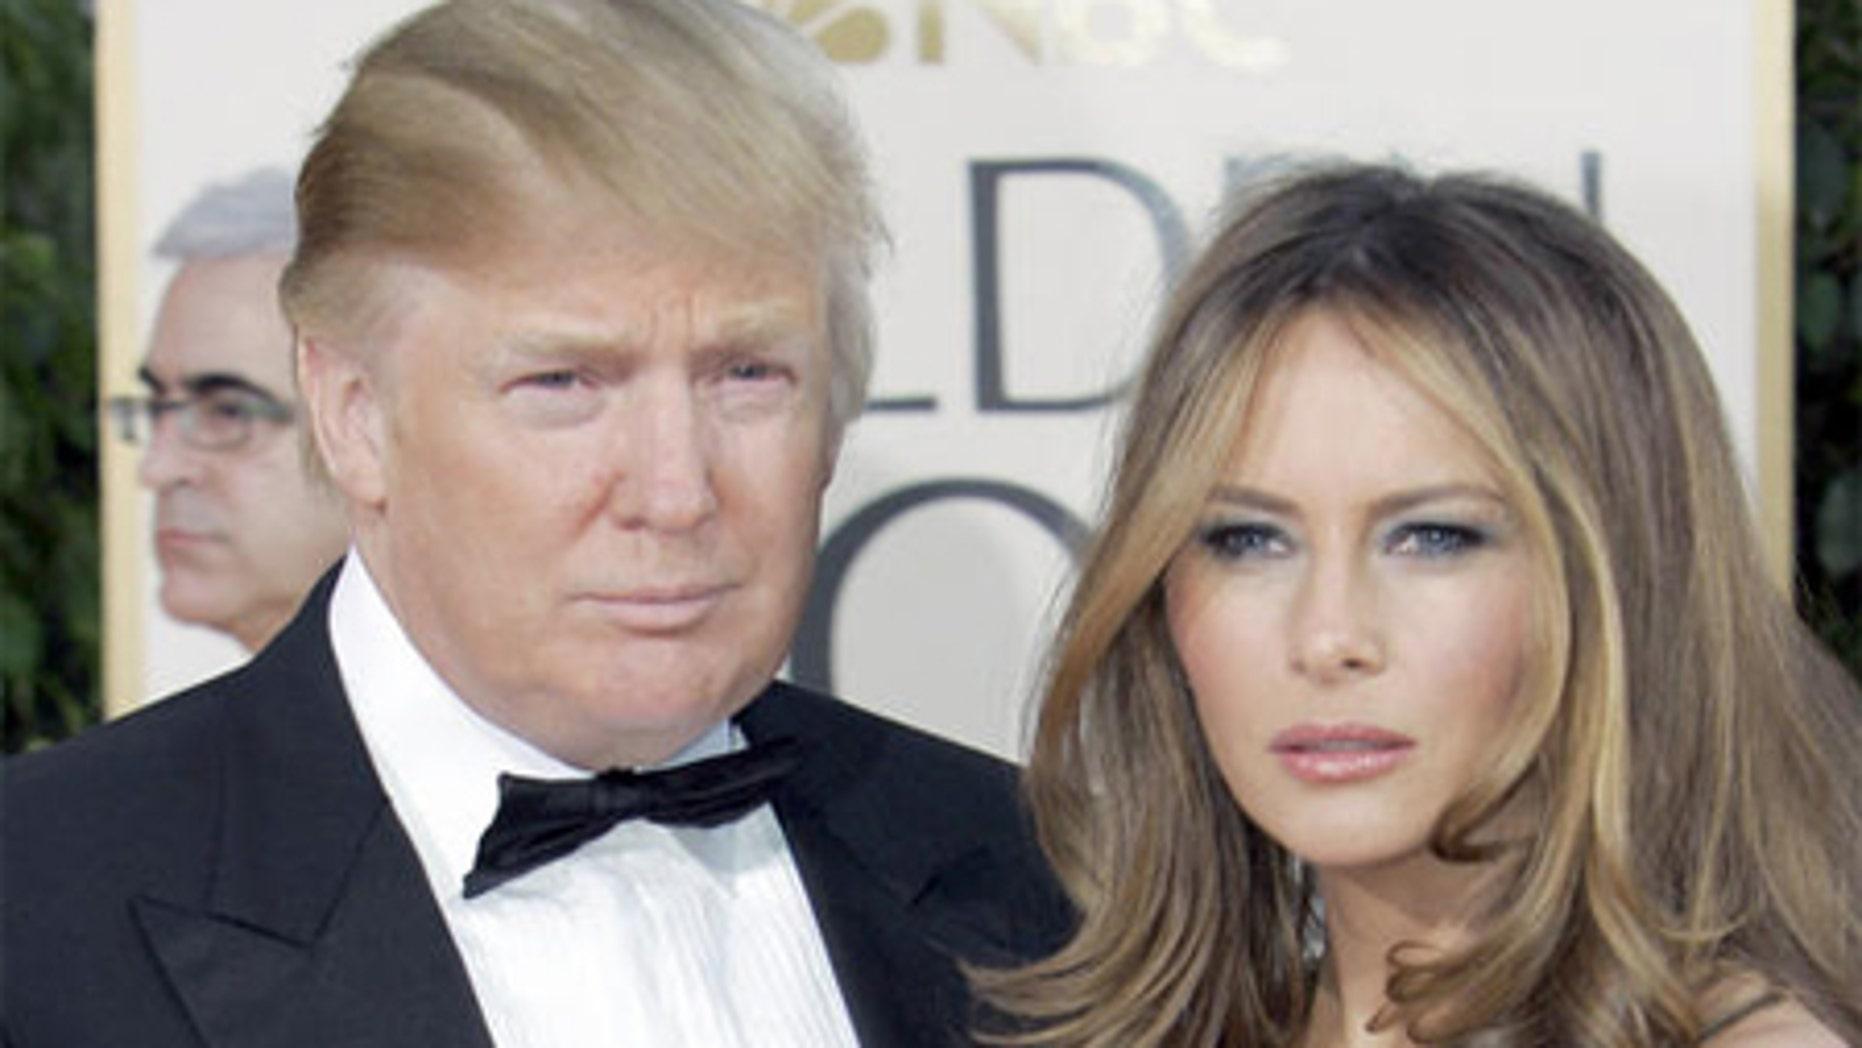 Donald Trump, left, and his wife Melania Trump.